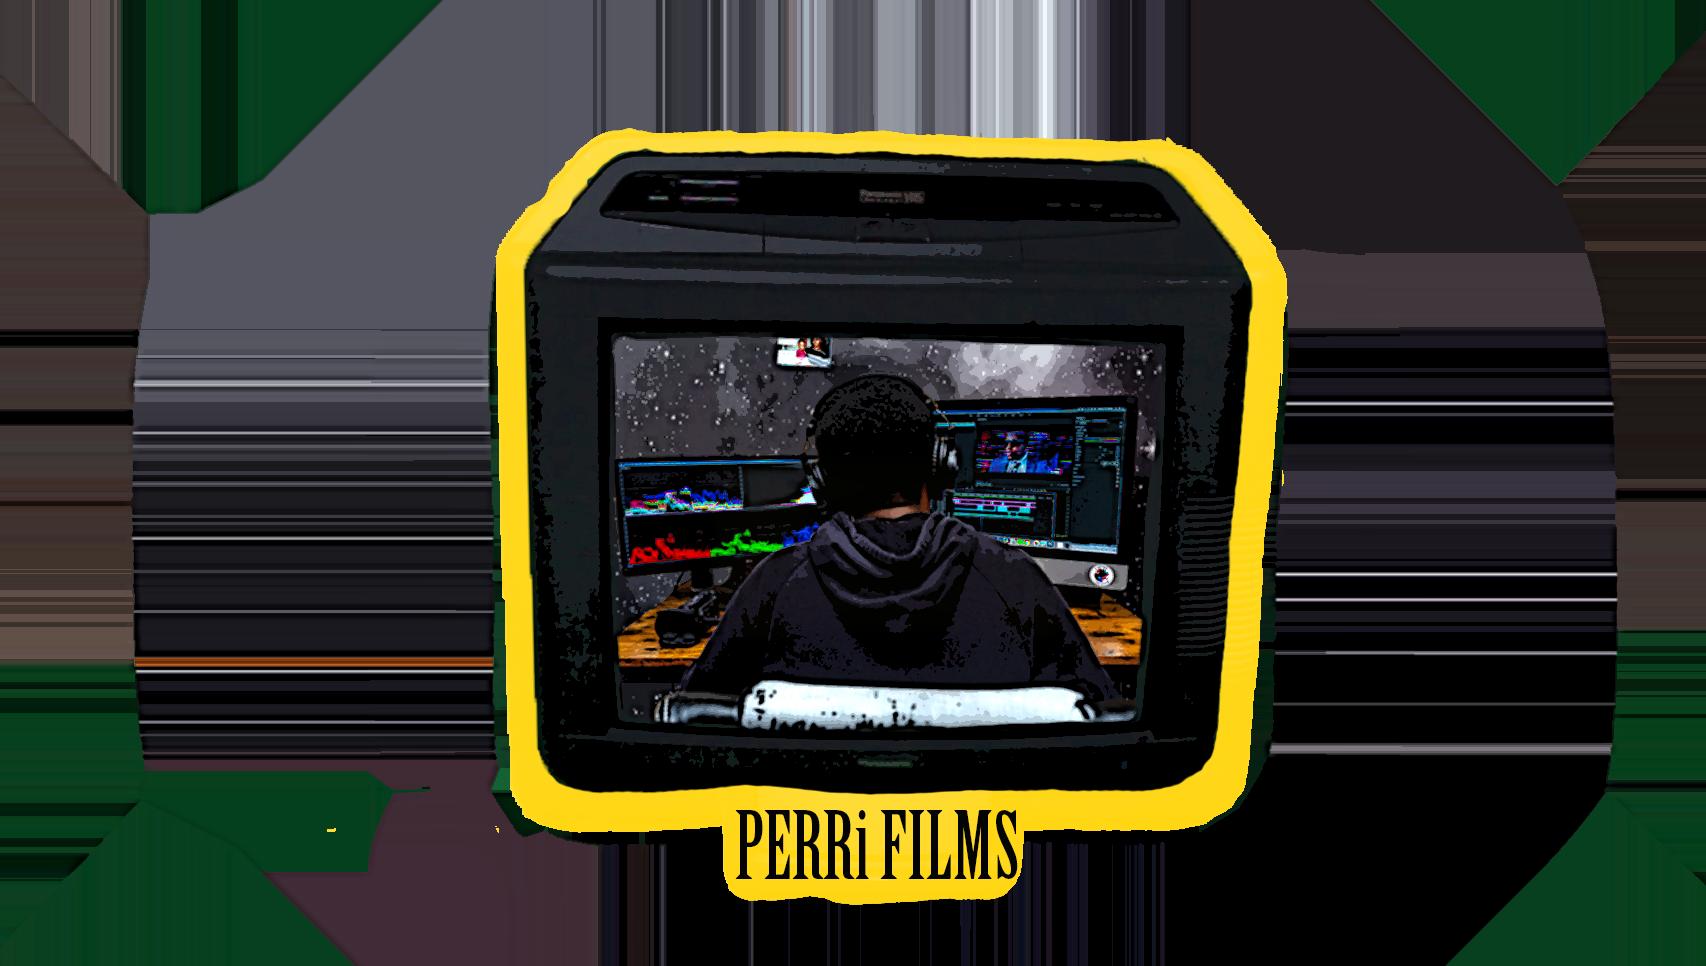 PerriFilms.com